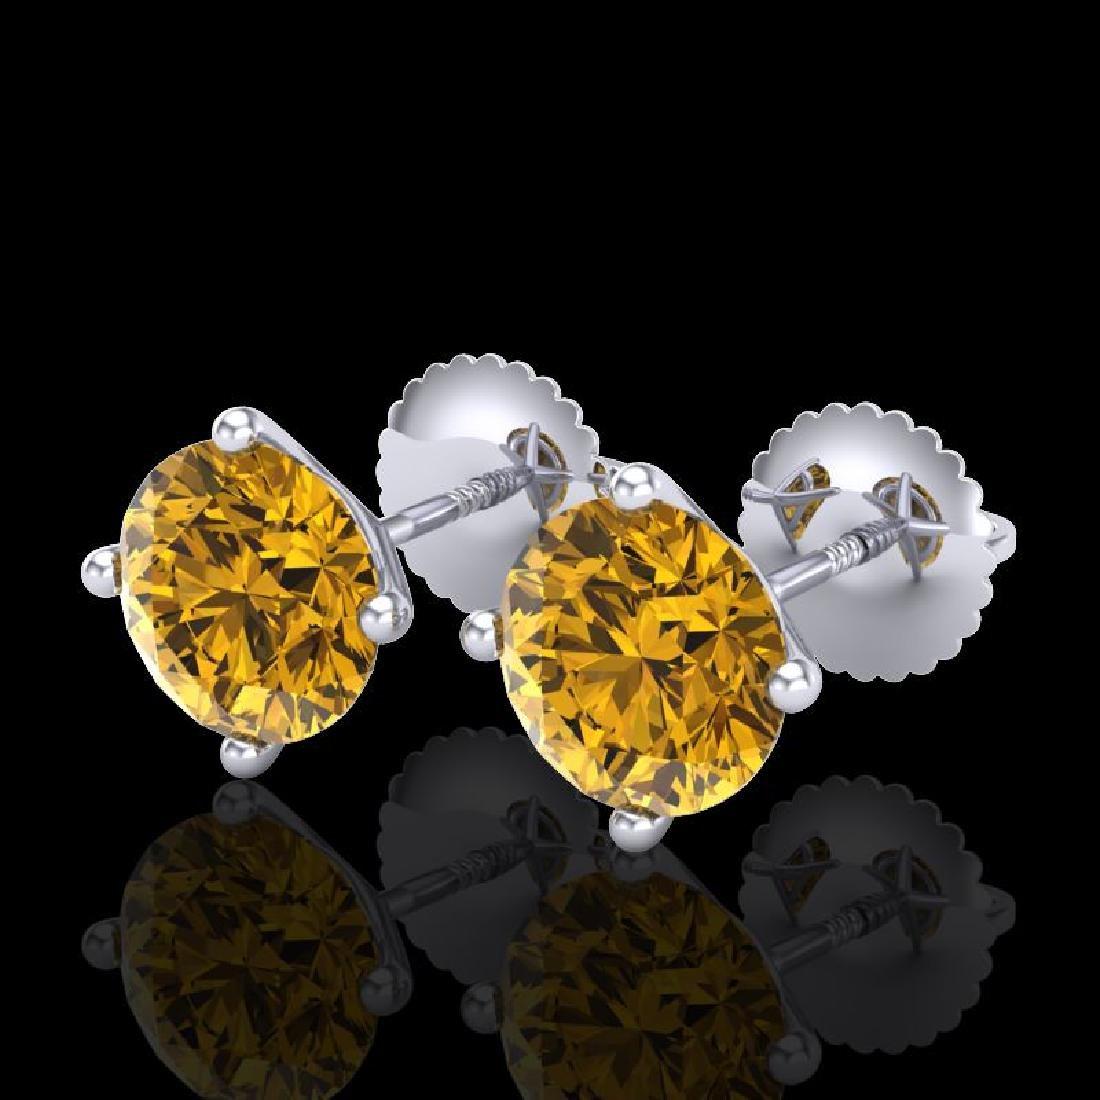 2.5 CTW Intense Fancy Yellow Diamond Art Deco Stud